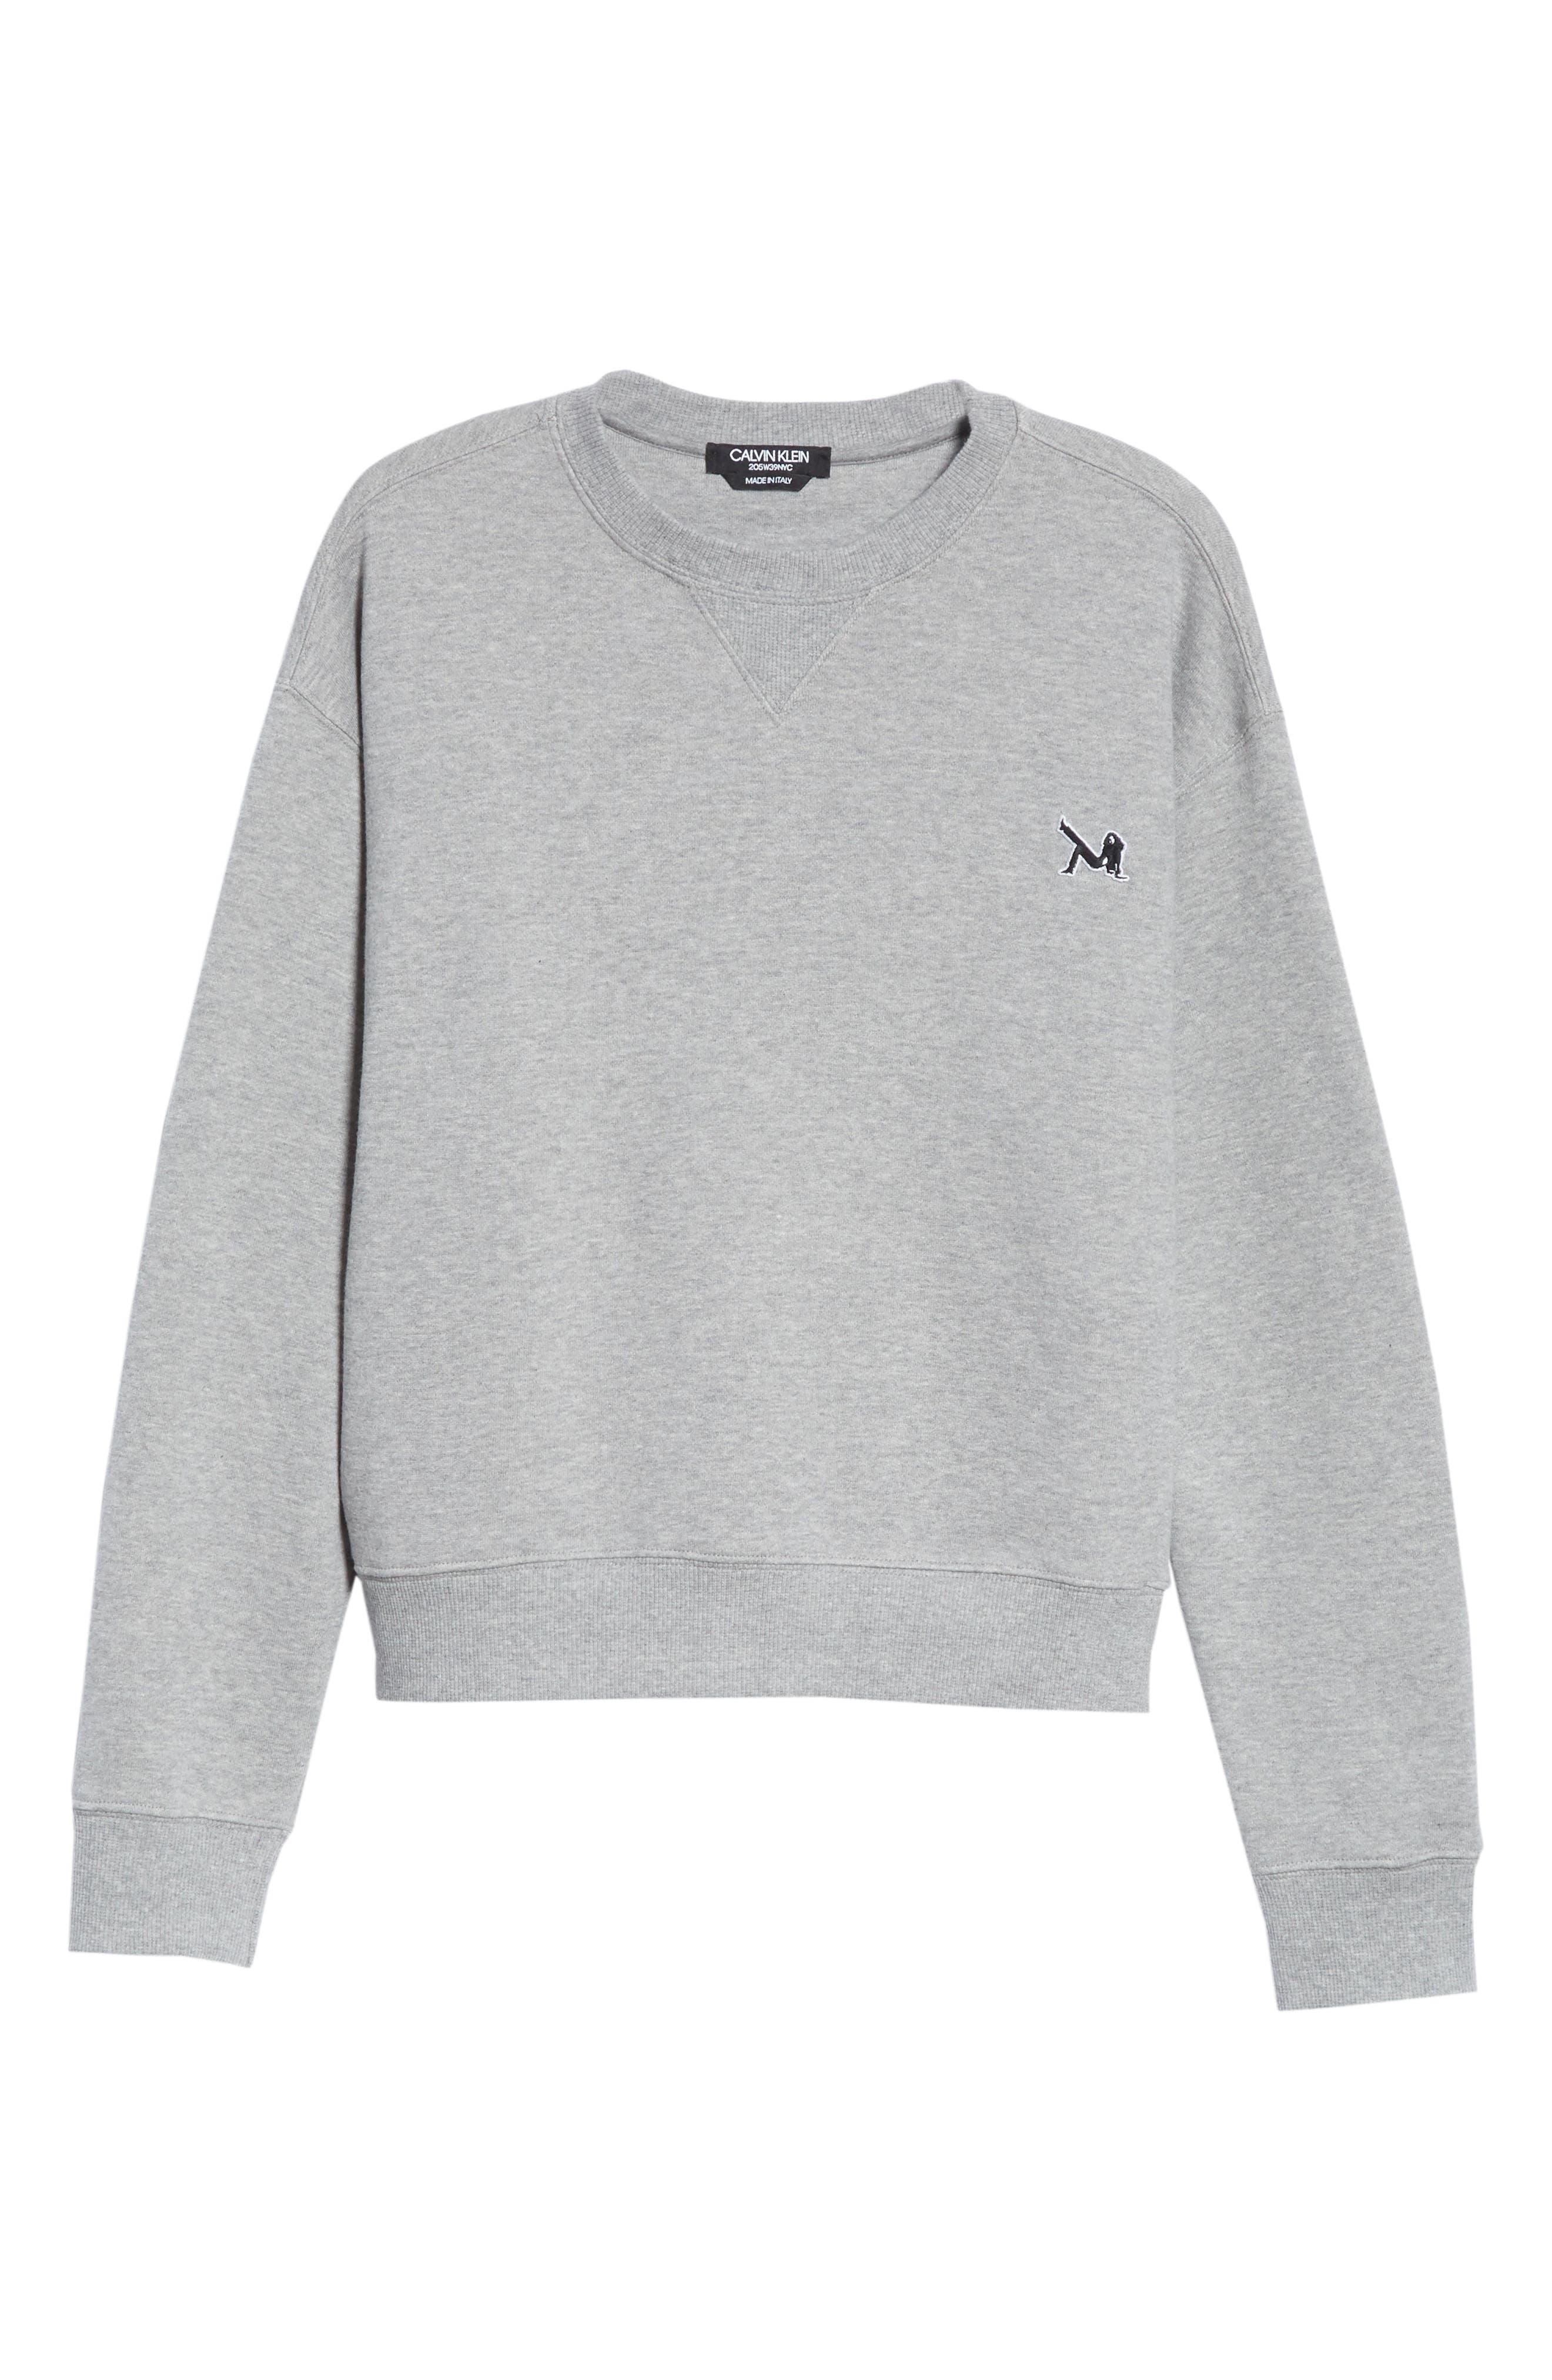 Brooke Shields Patch Sweatshirt,                             Alternate thumbnail 6, color,                             Grey